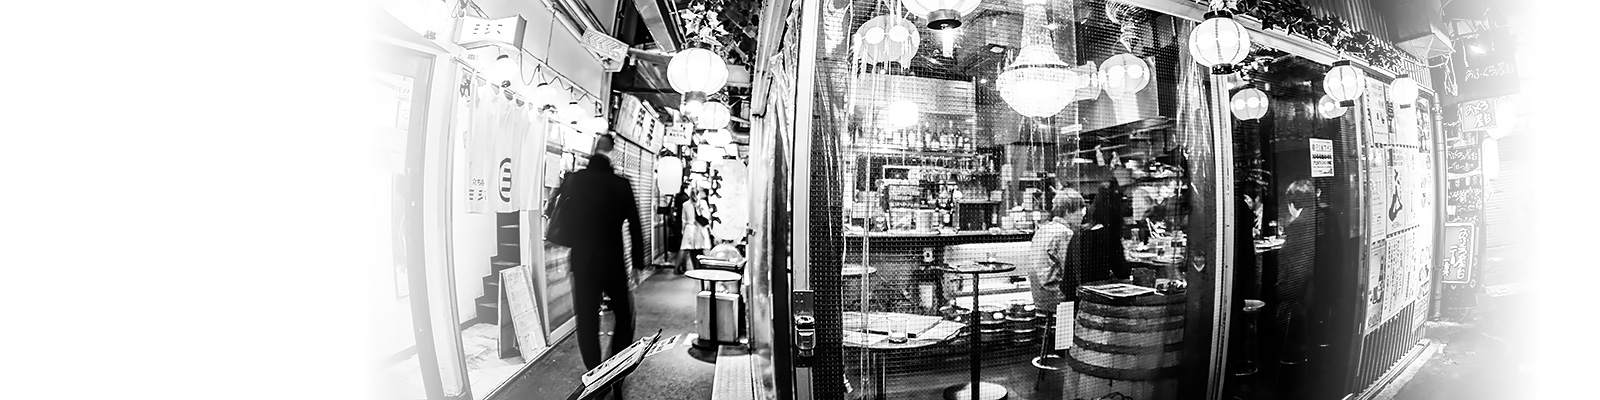 居酒屋 横丁 空間 時代 イメージ